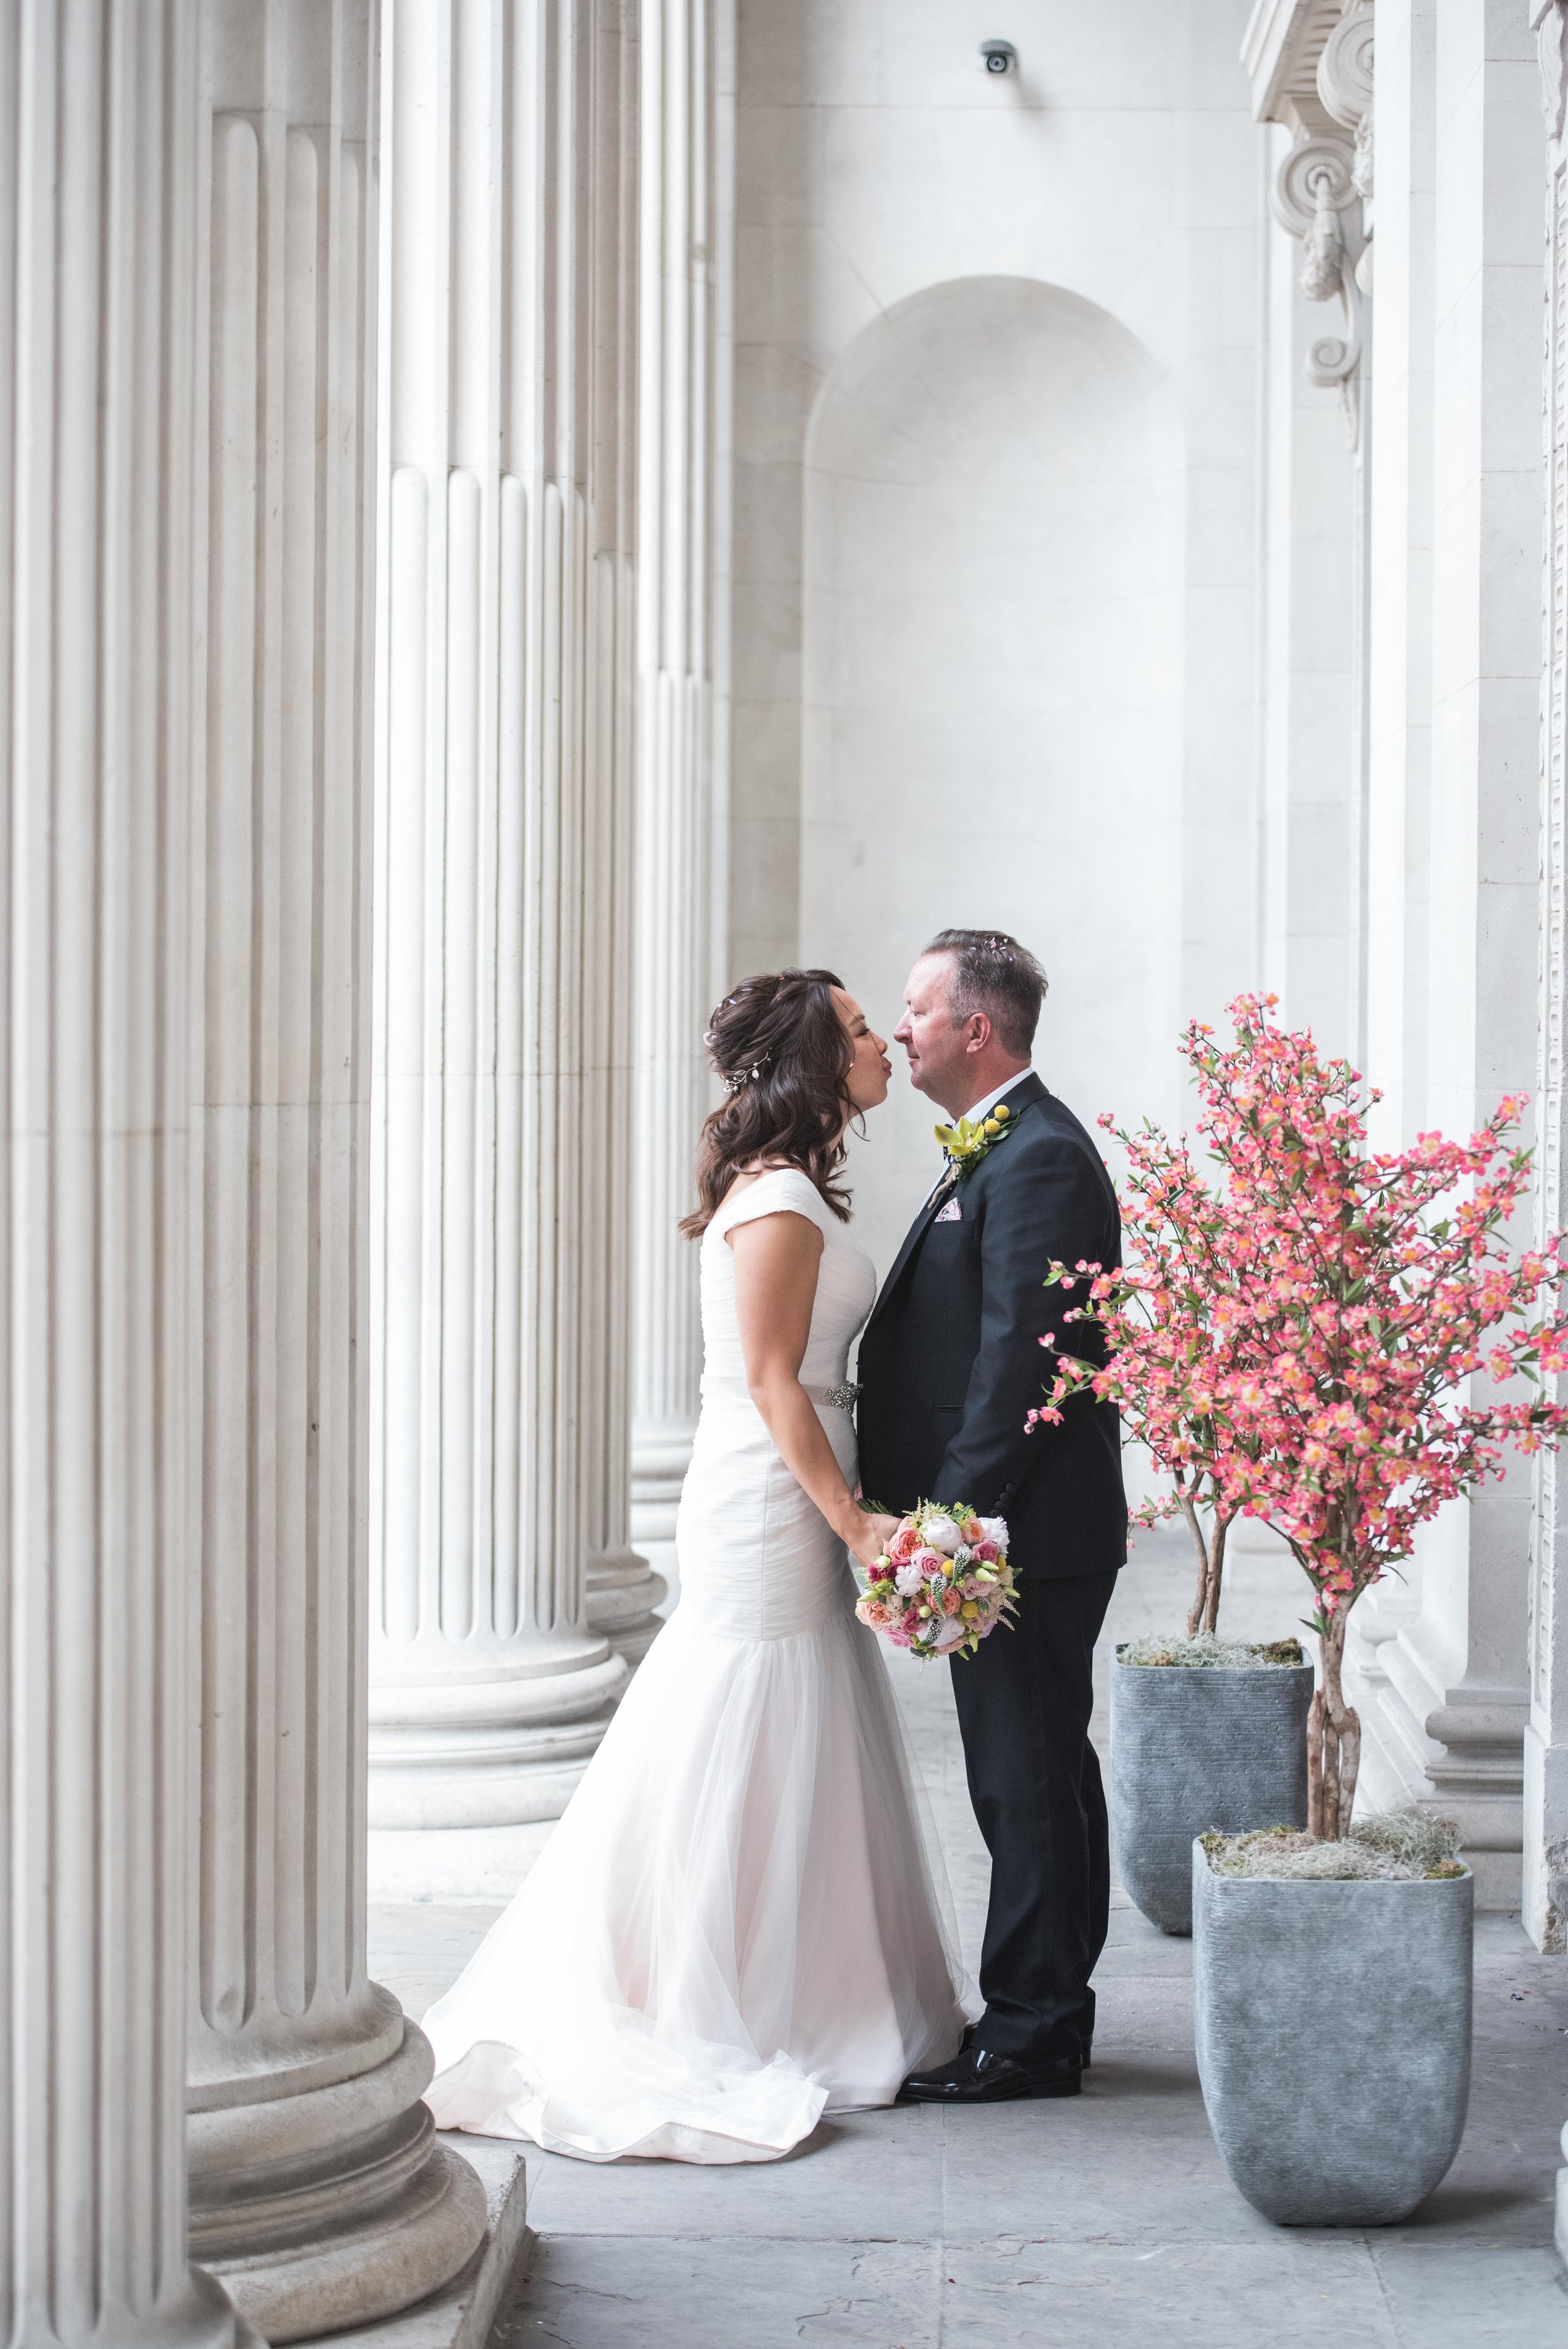 D&M_Marylebone Town Hall Wedding (142 of 239).jpg